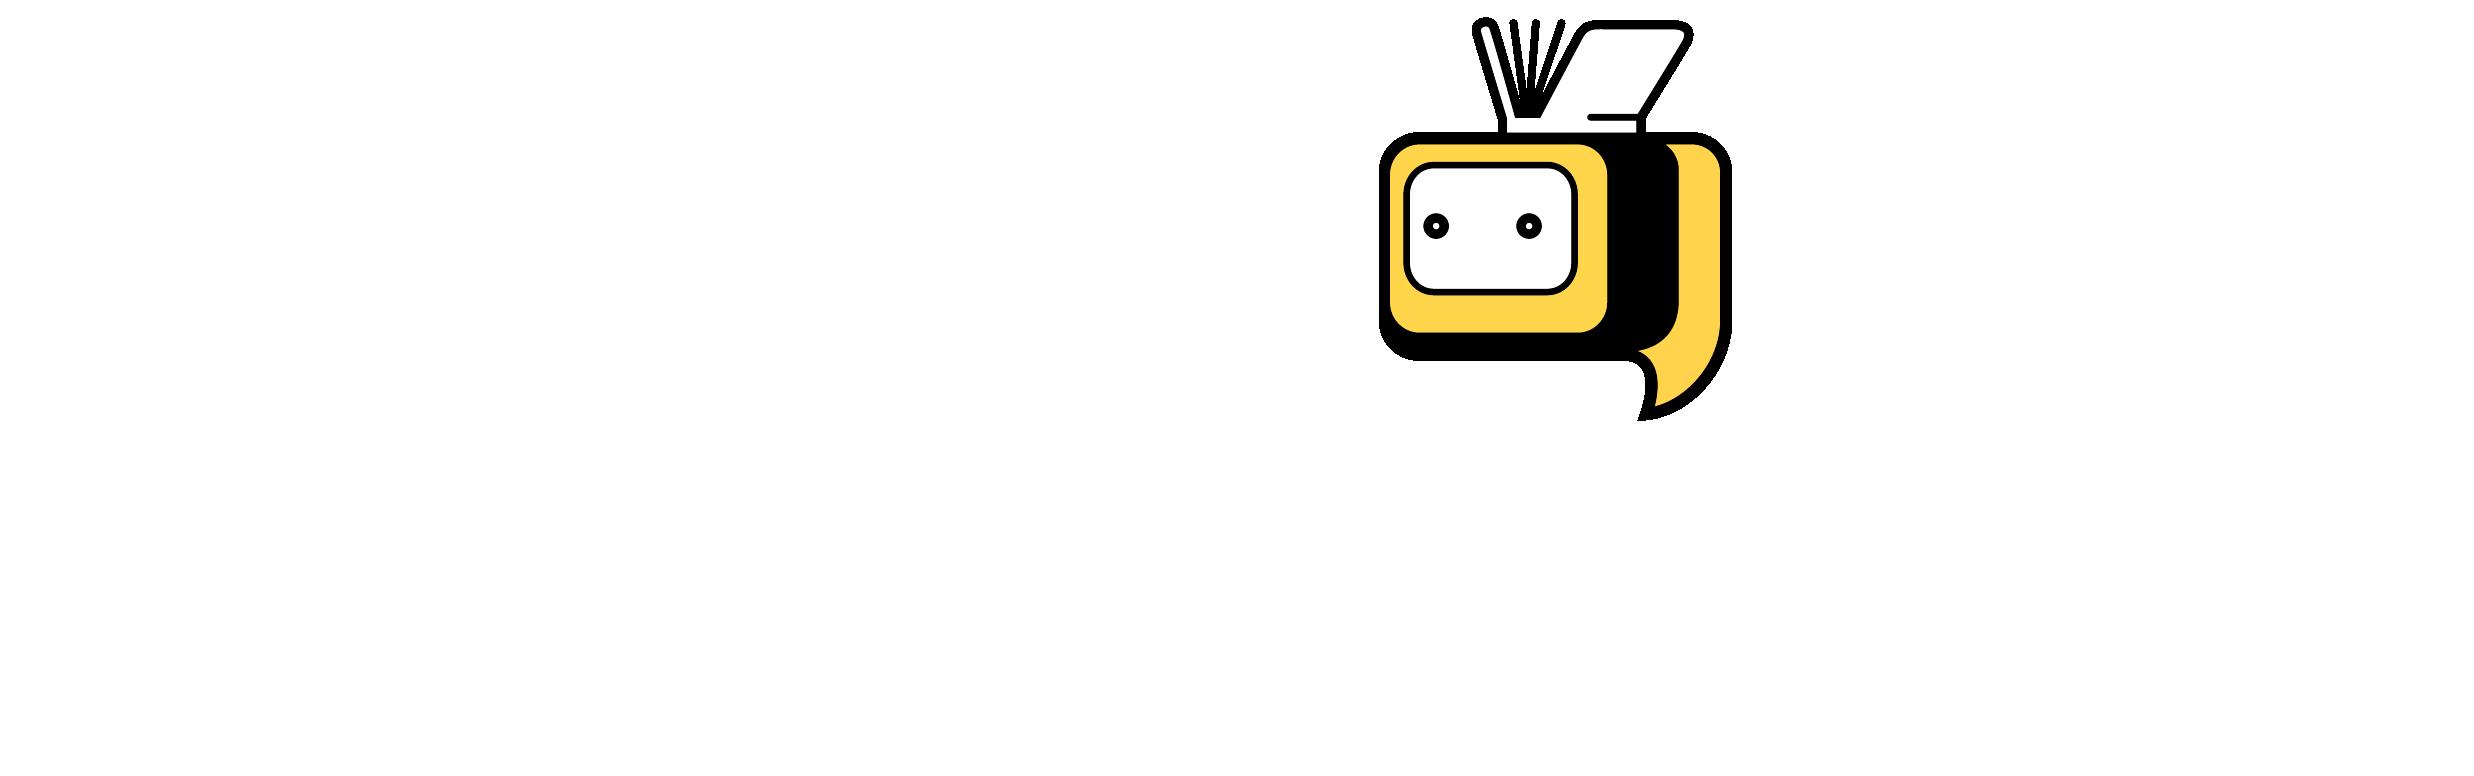 ookbee buffet logo